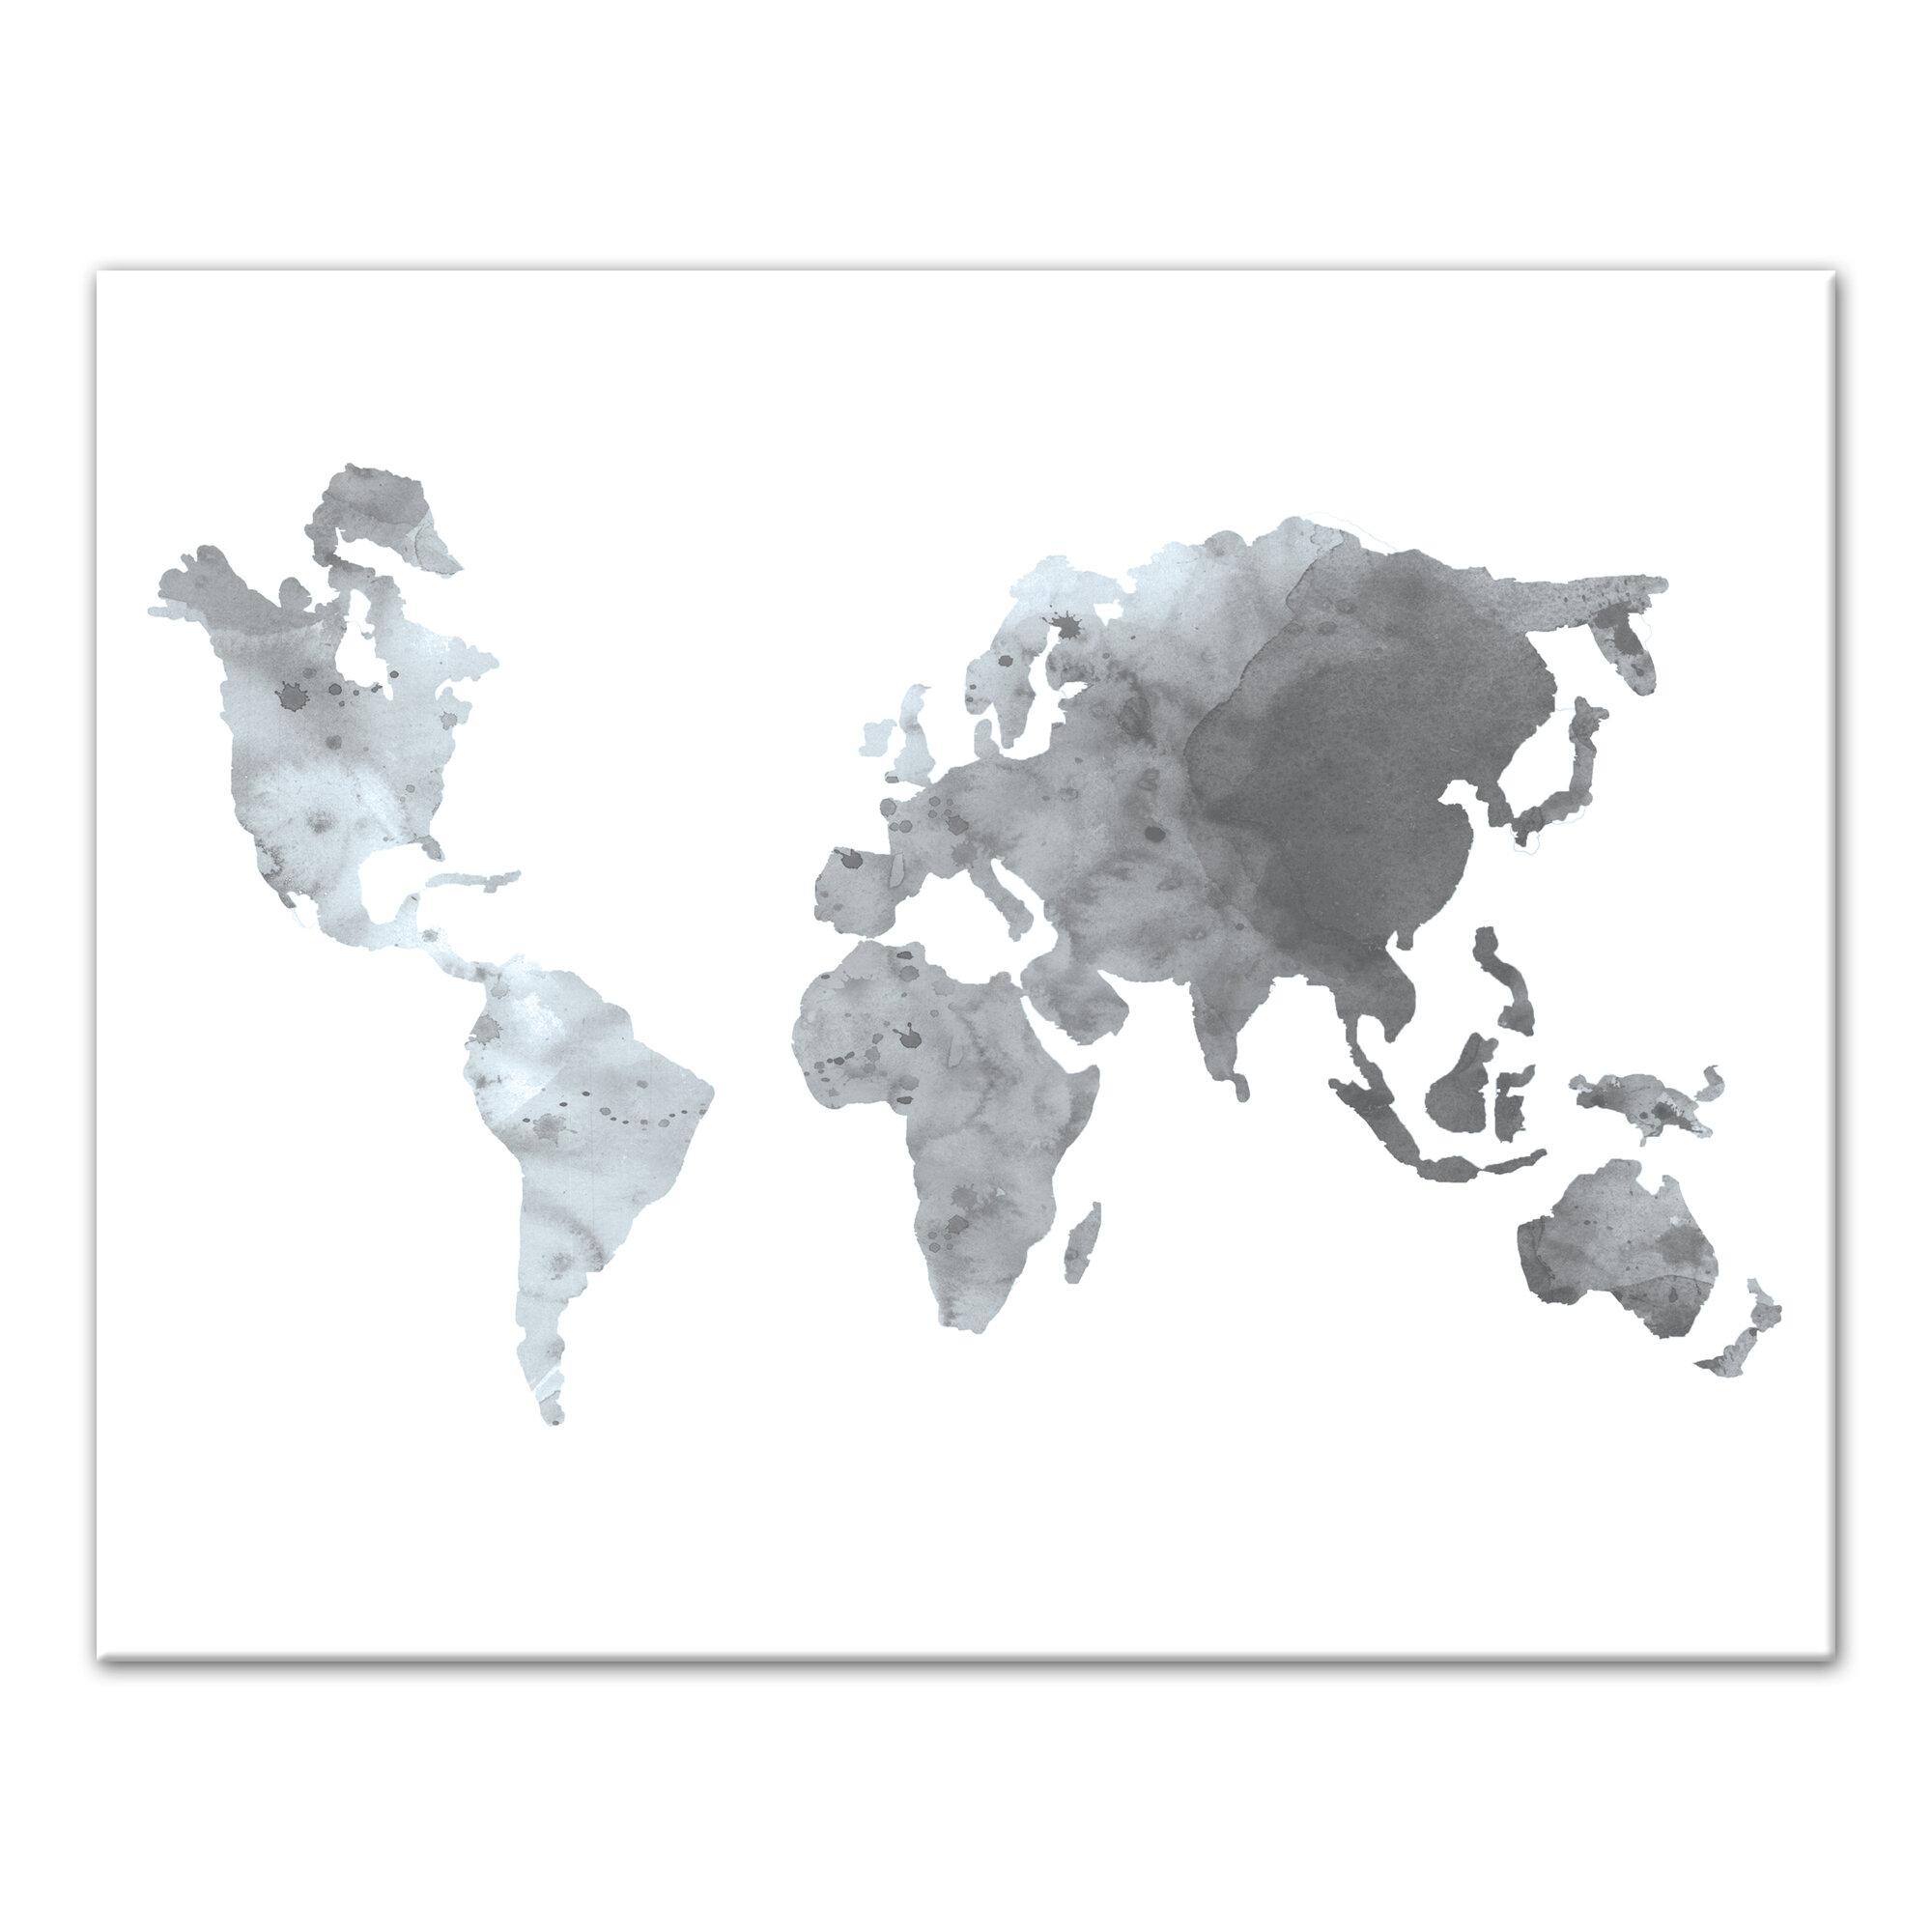 Bloomsbury Market \'Gray World Map\' Watercolor Painting Print | Wayfair